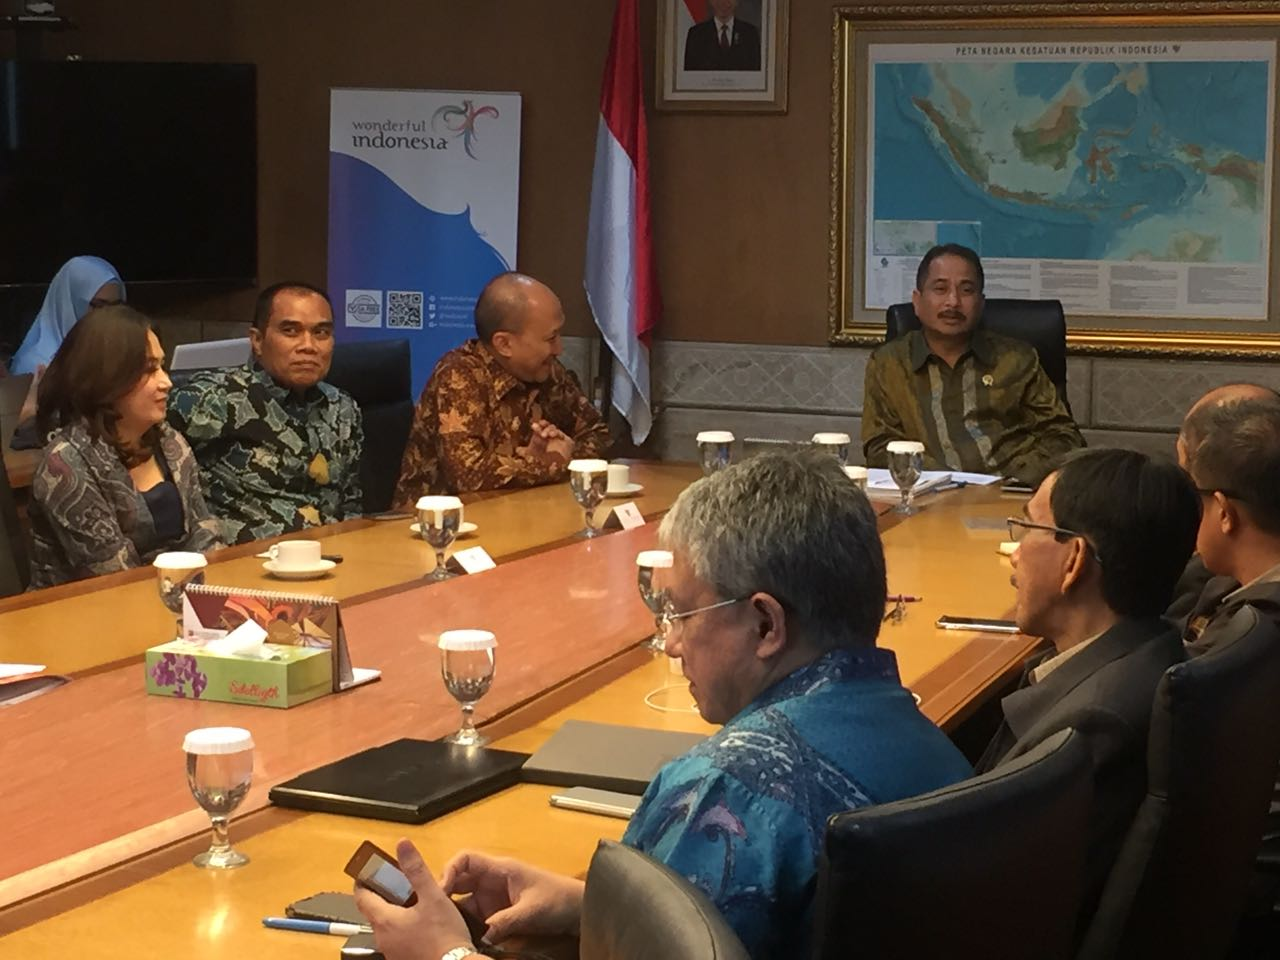 Pemaparan PKS dengan Kementerian Pariwisata